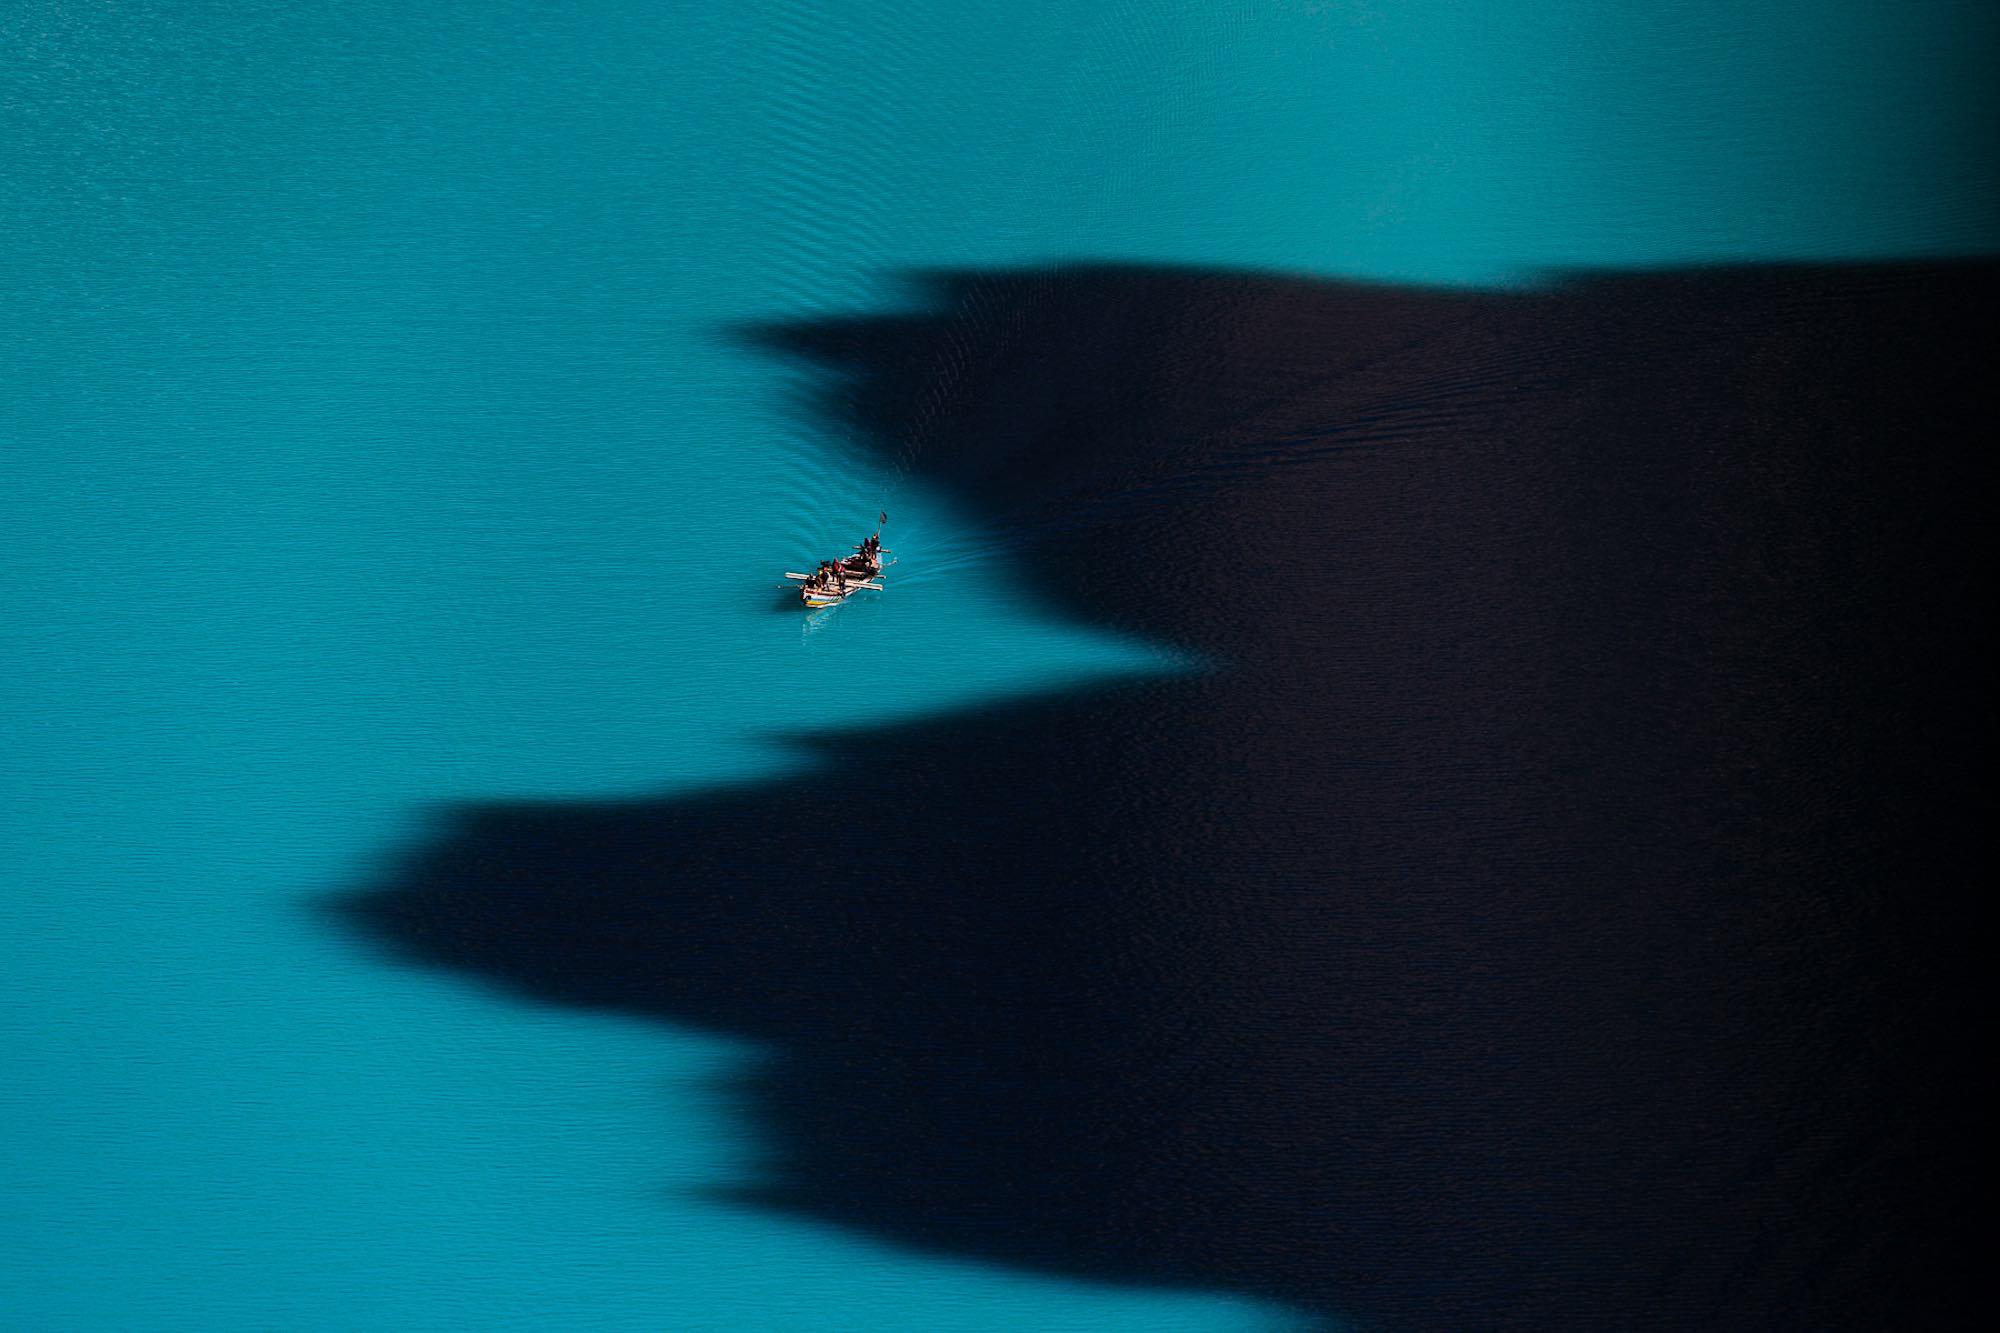 Lac Attabad - Yann Arthus-Bertrand